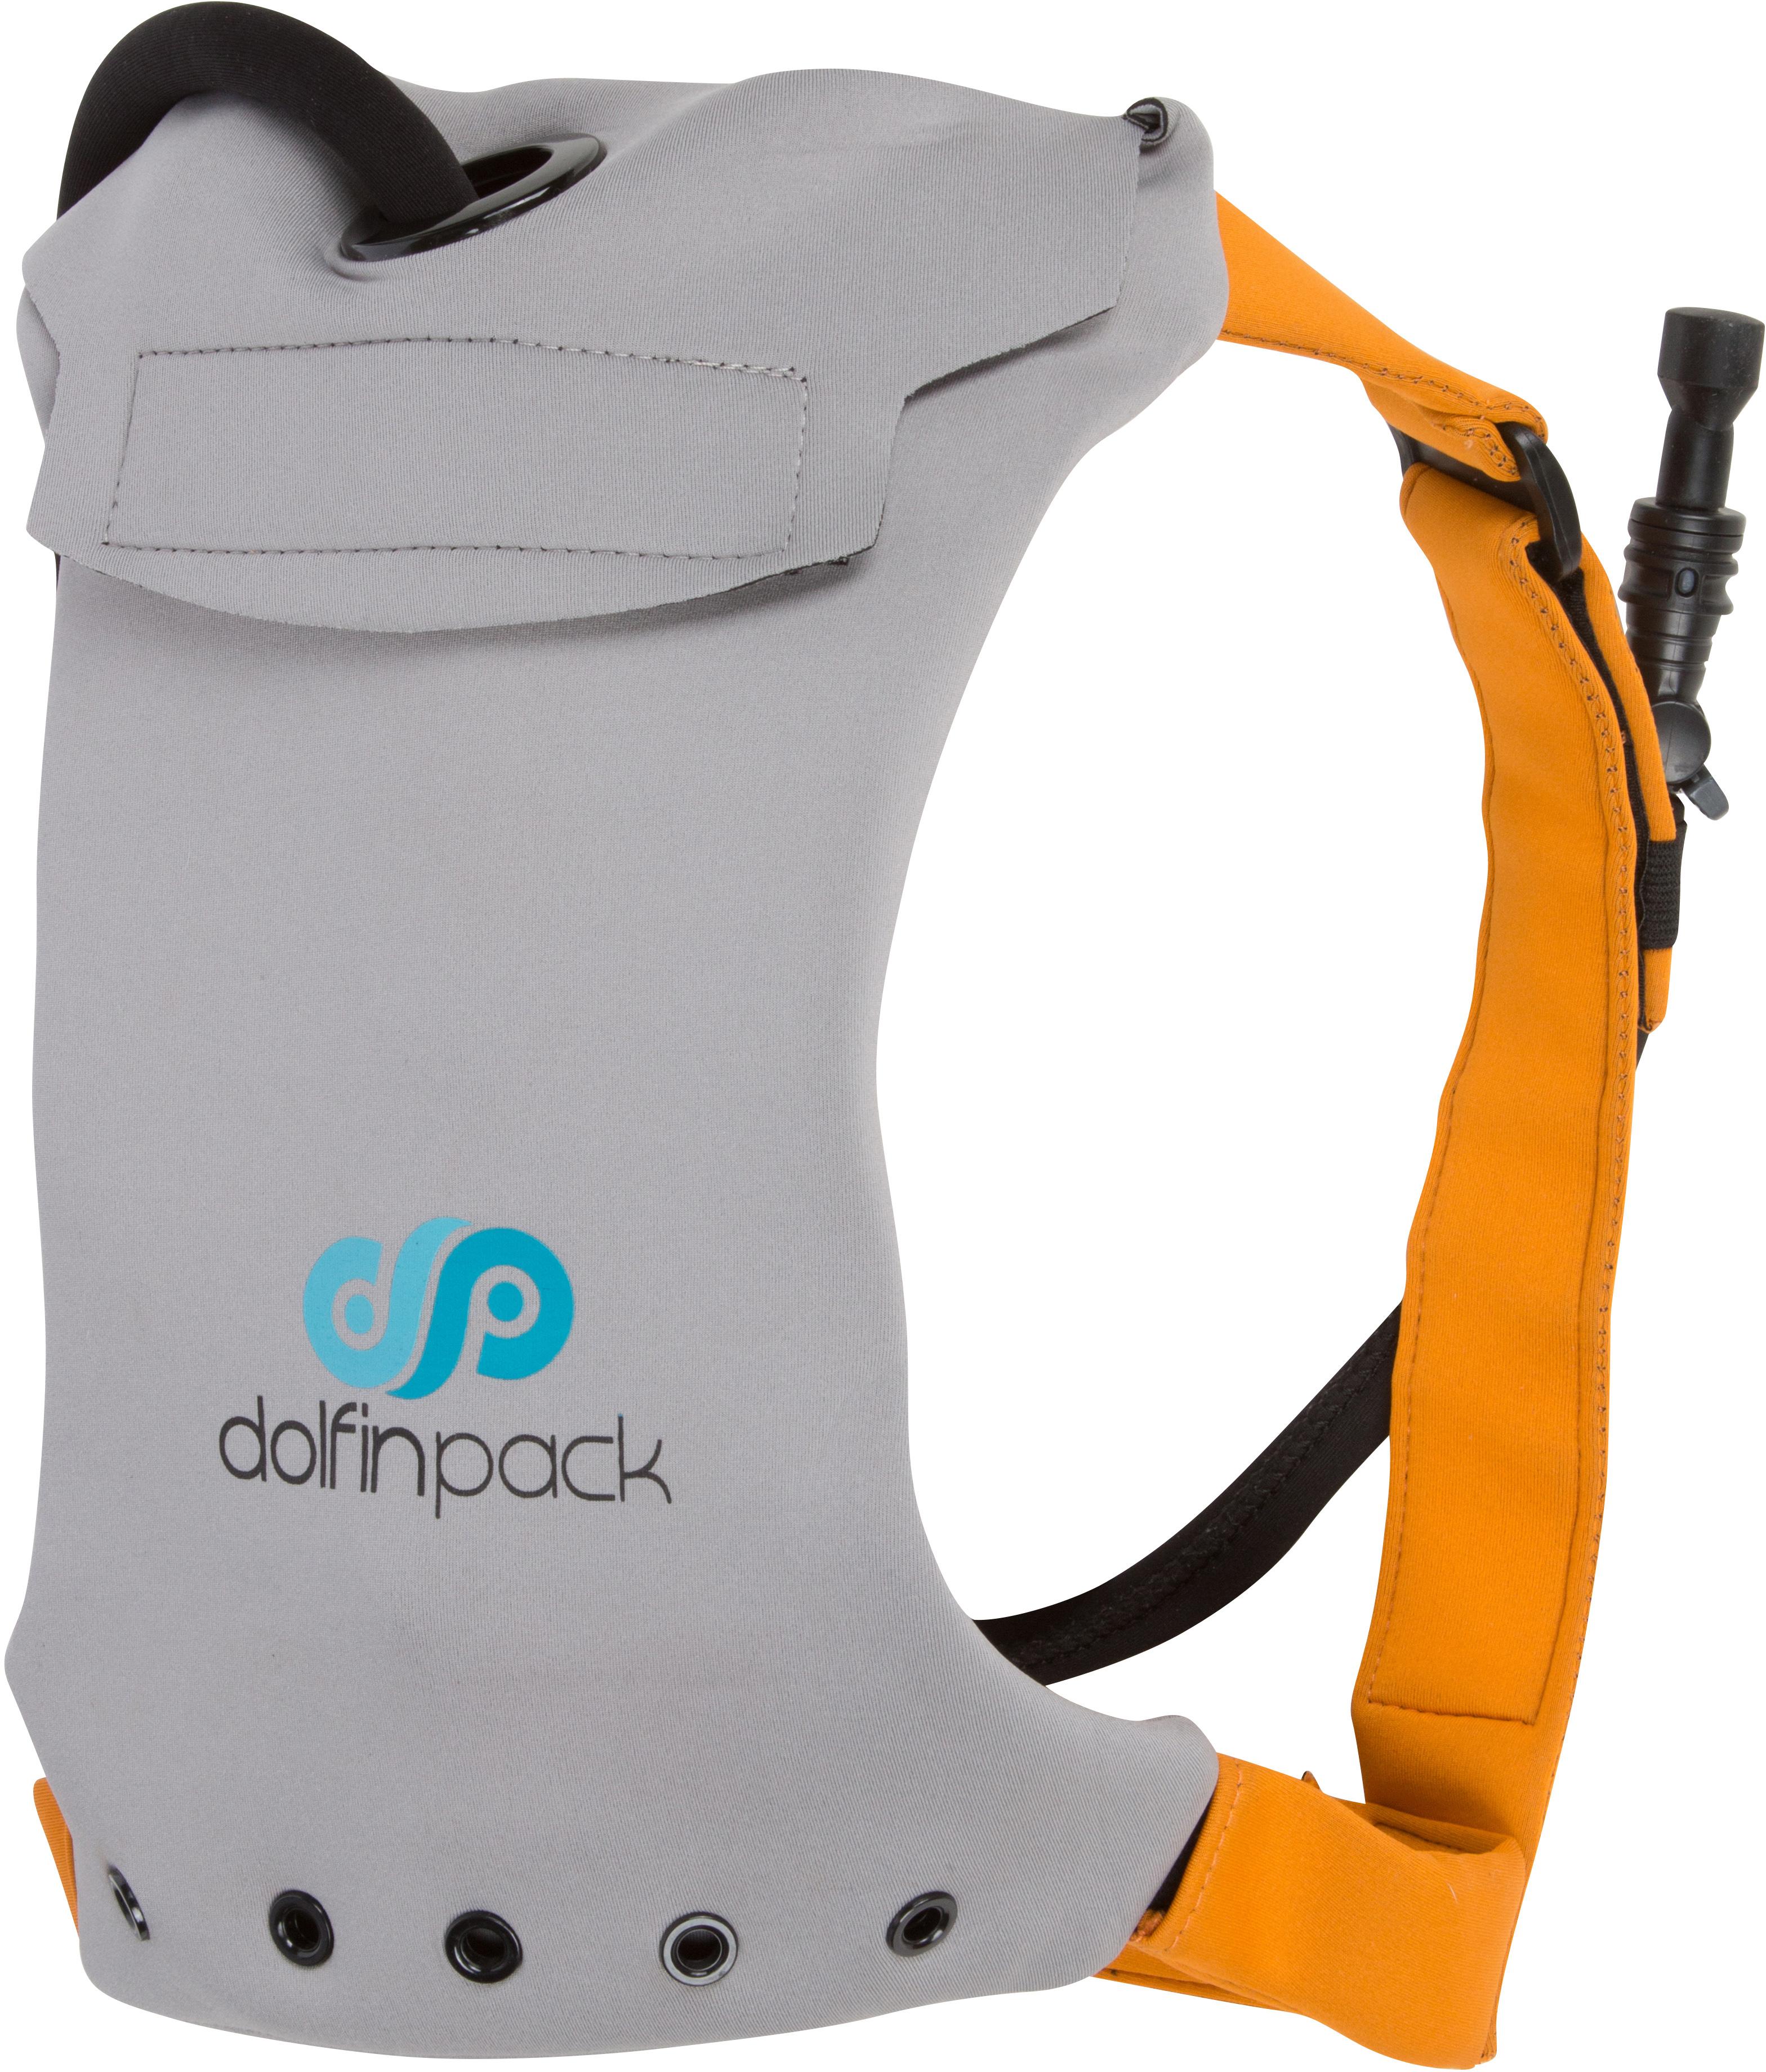 DolfinPack Lightweight, Form-fitting, Waterproof, Extreme Sports Hydration Pack Grey Burnt Orange by DolfinPack